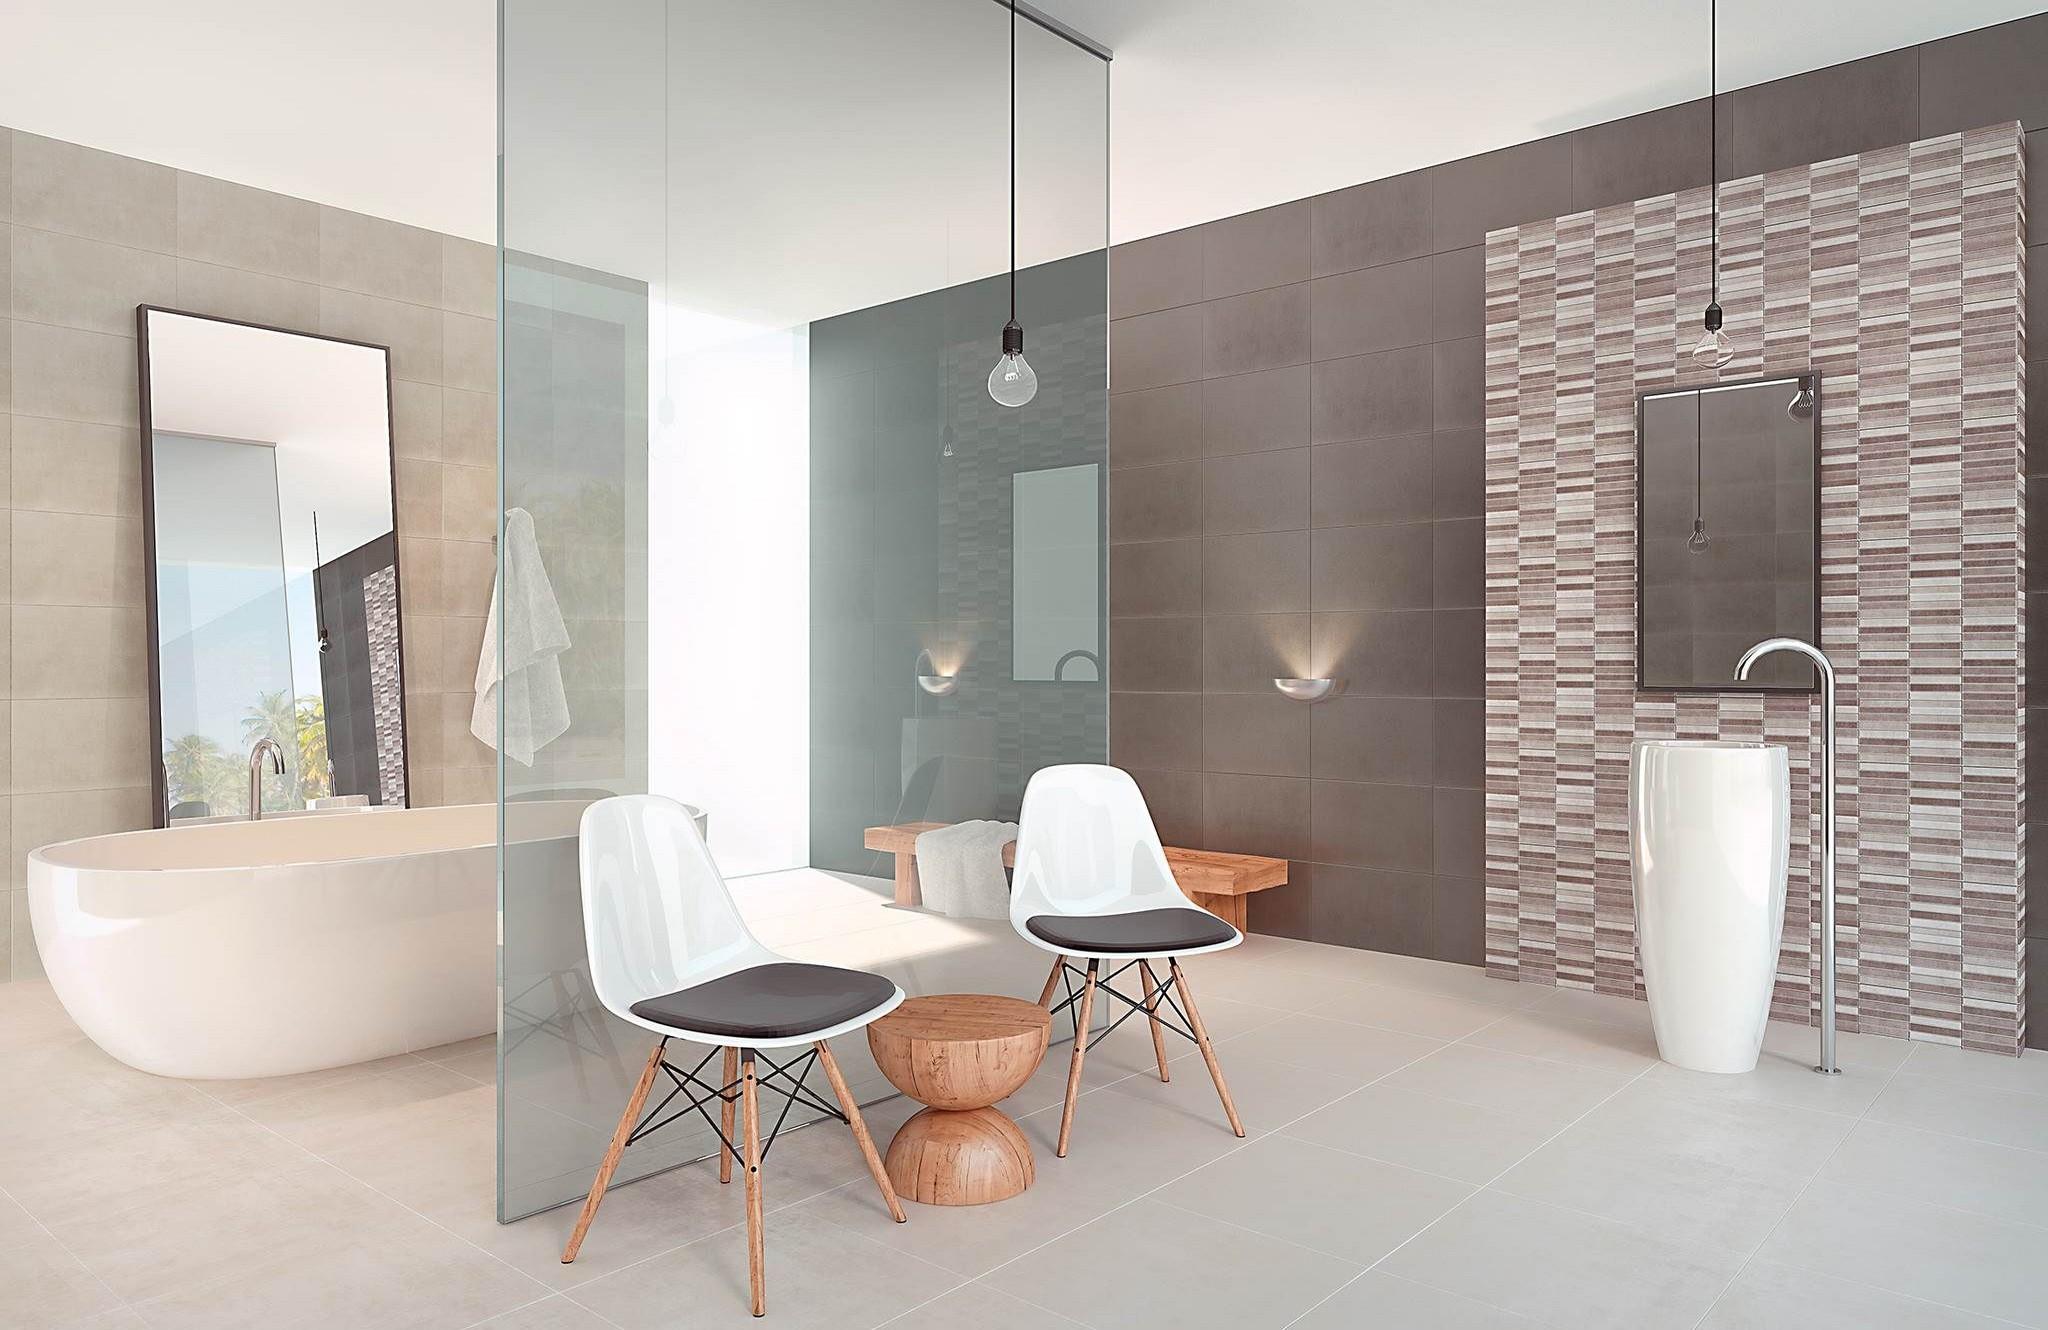 Salle De Bain Azulejos ~ faience salle de bain cifre serie modus 25×70 1 choix carrelage